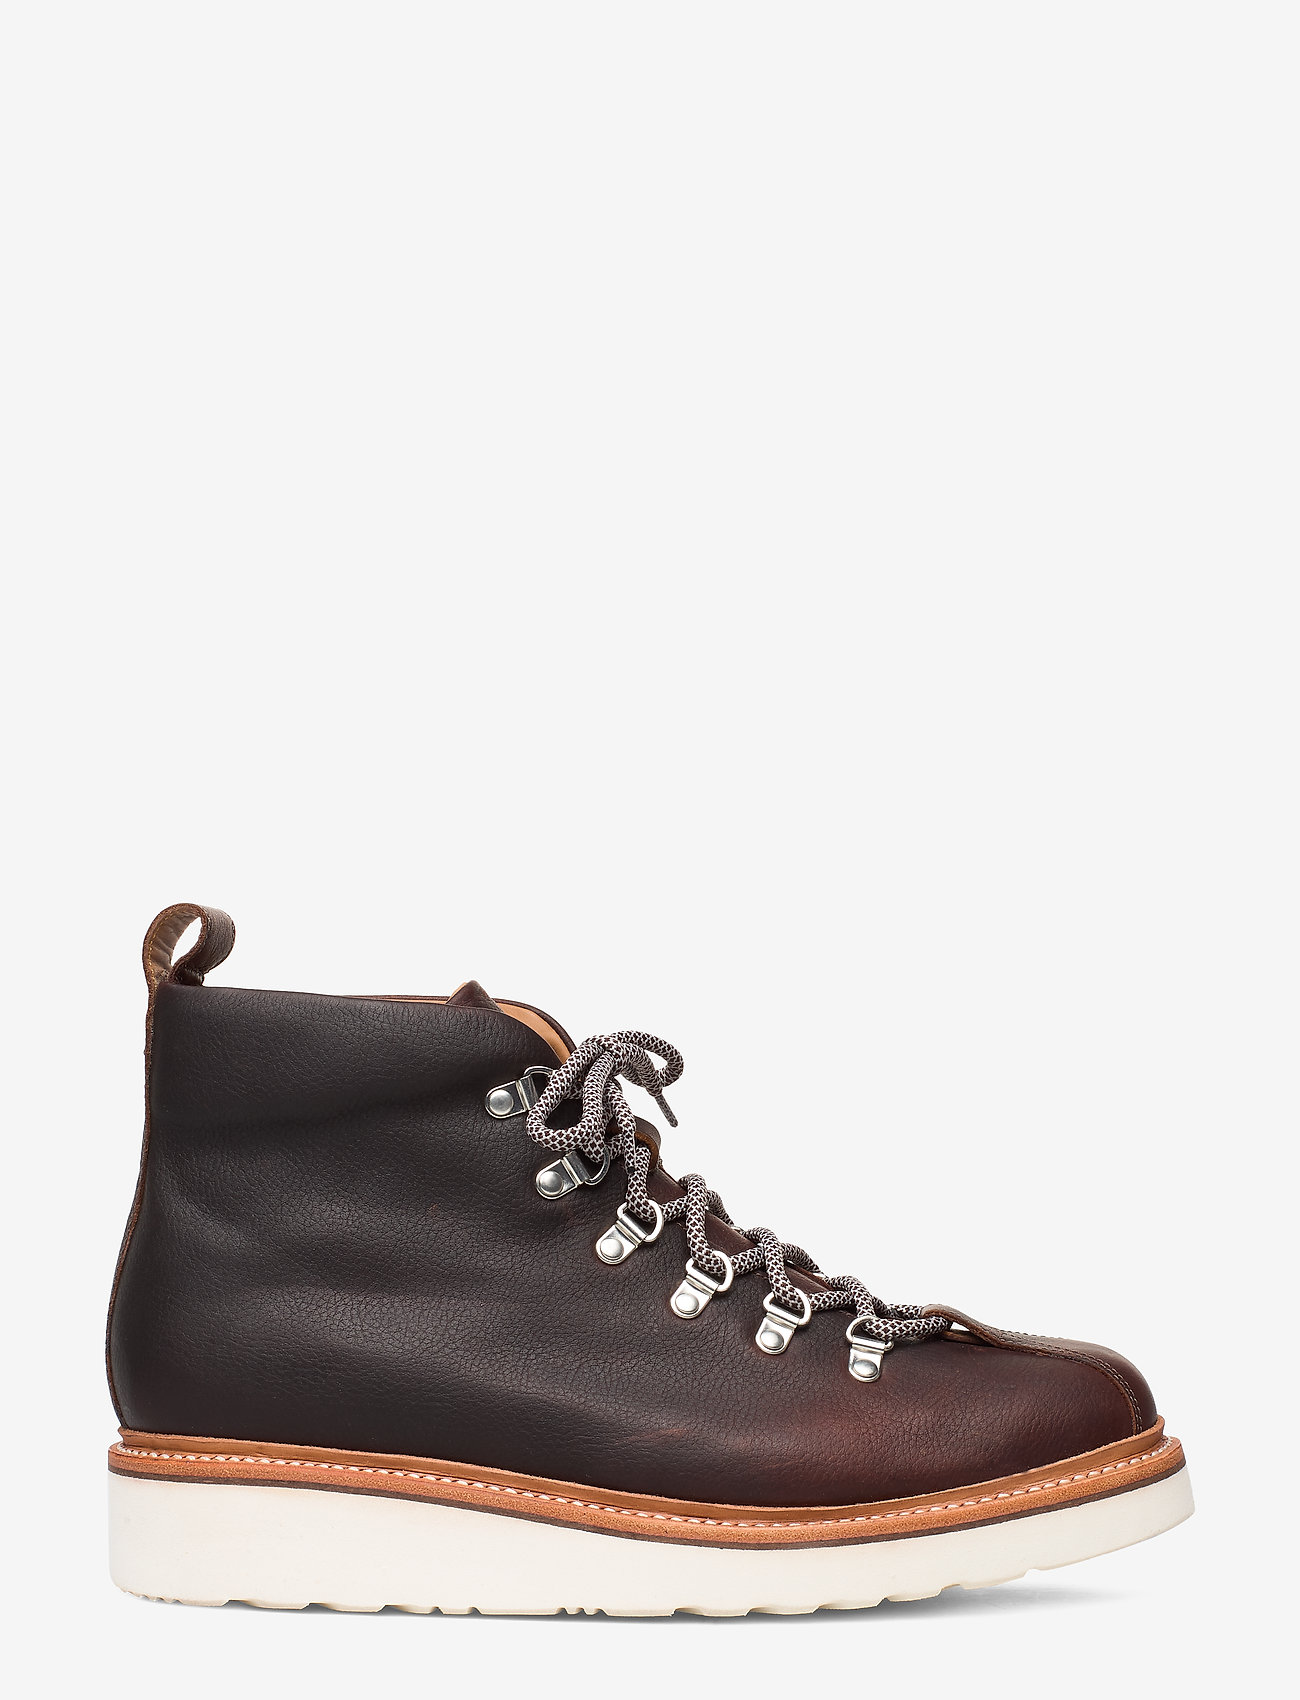 Grenson - BOBBY - veter schoenen - brown - 1